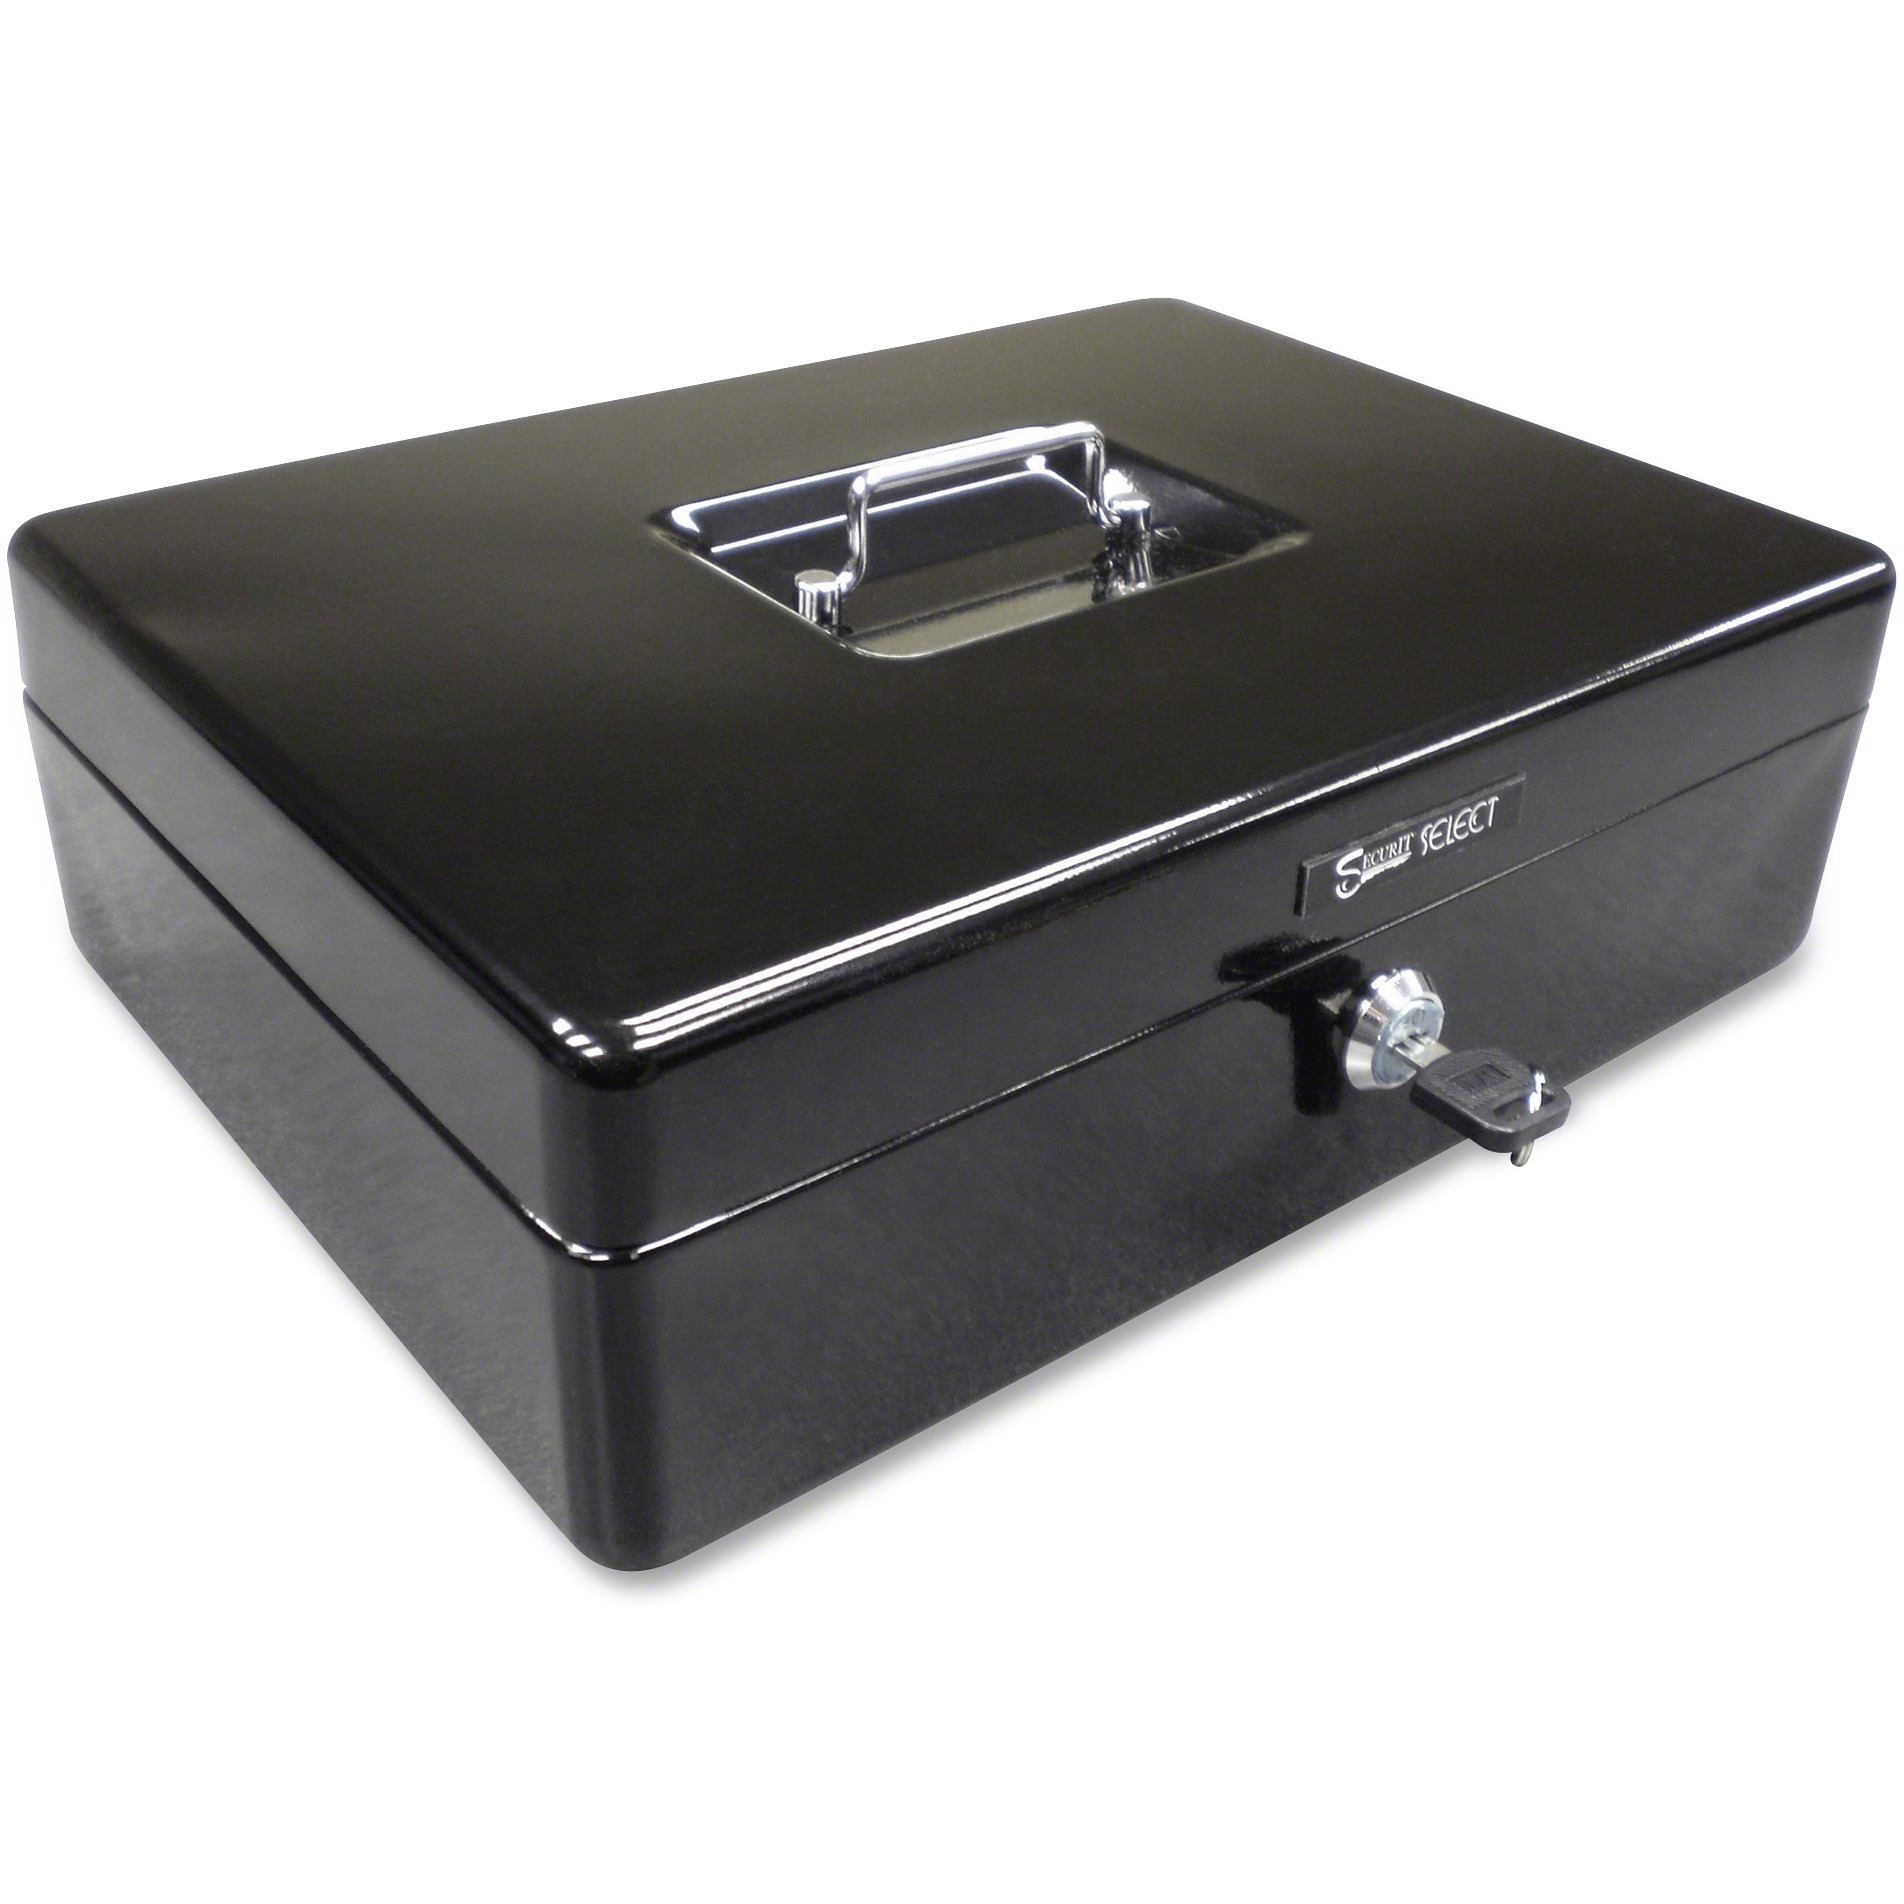 PM, PMC04804, 9-Compartment Spacious Size Cash Box, Black,Silver